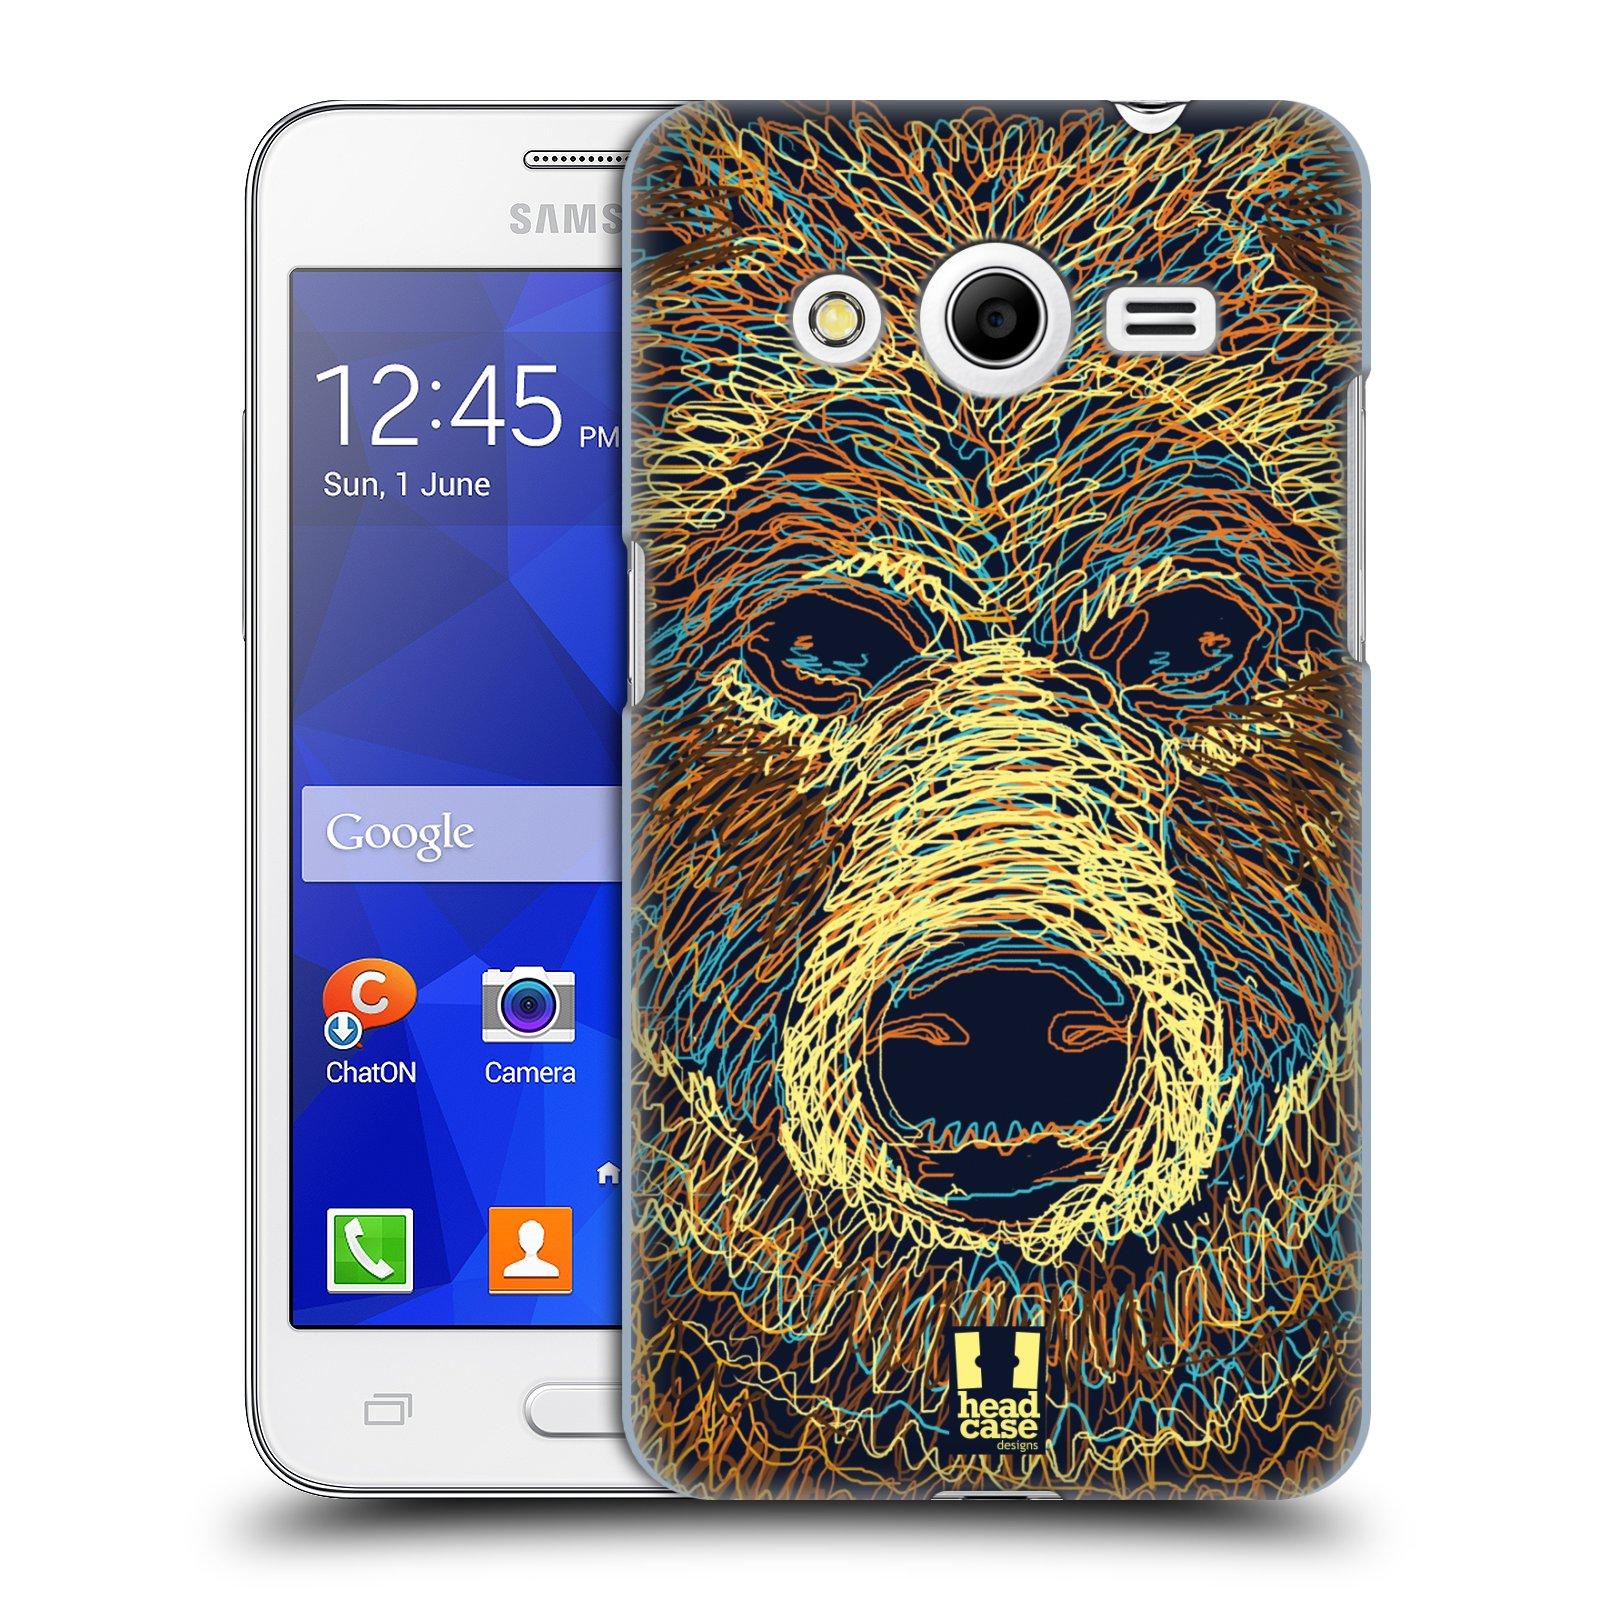 HEAD CASE plastový obal na mobil SAMSUNG GALAXY Core 2 (G355H) vzor zvíře čmáranice medvěd